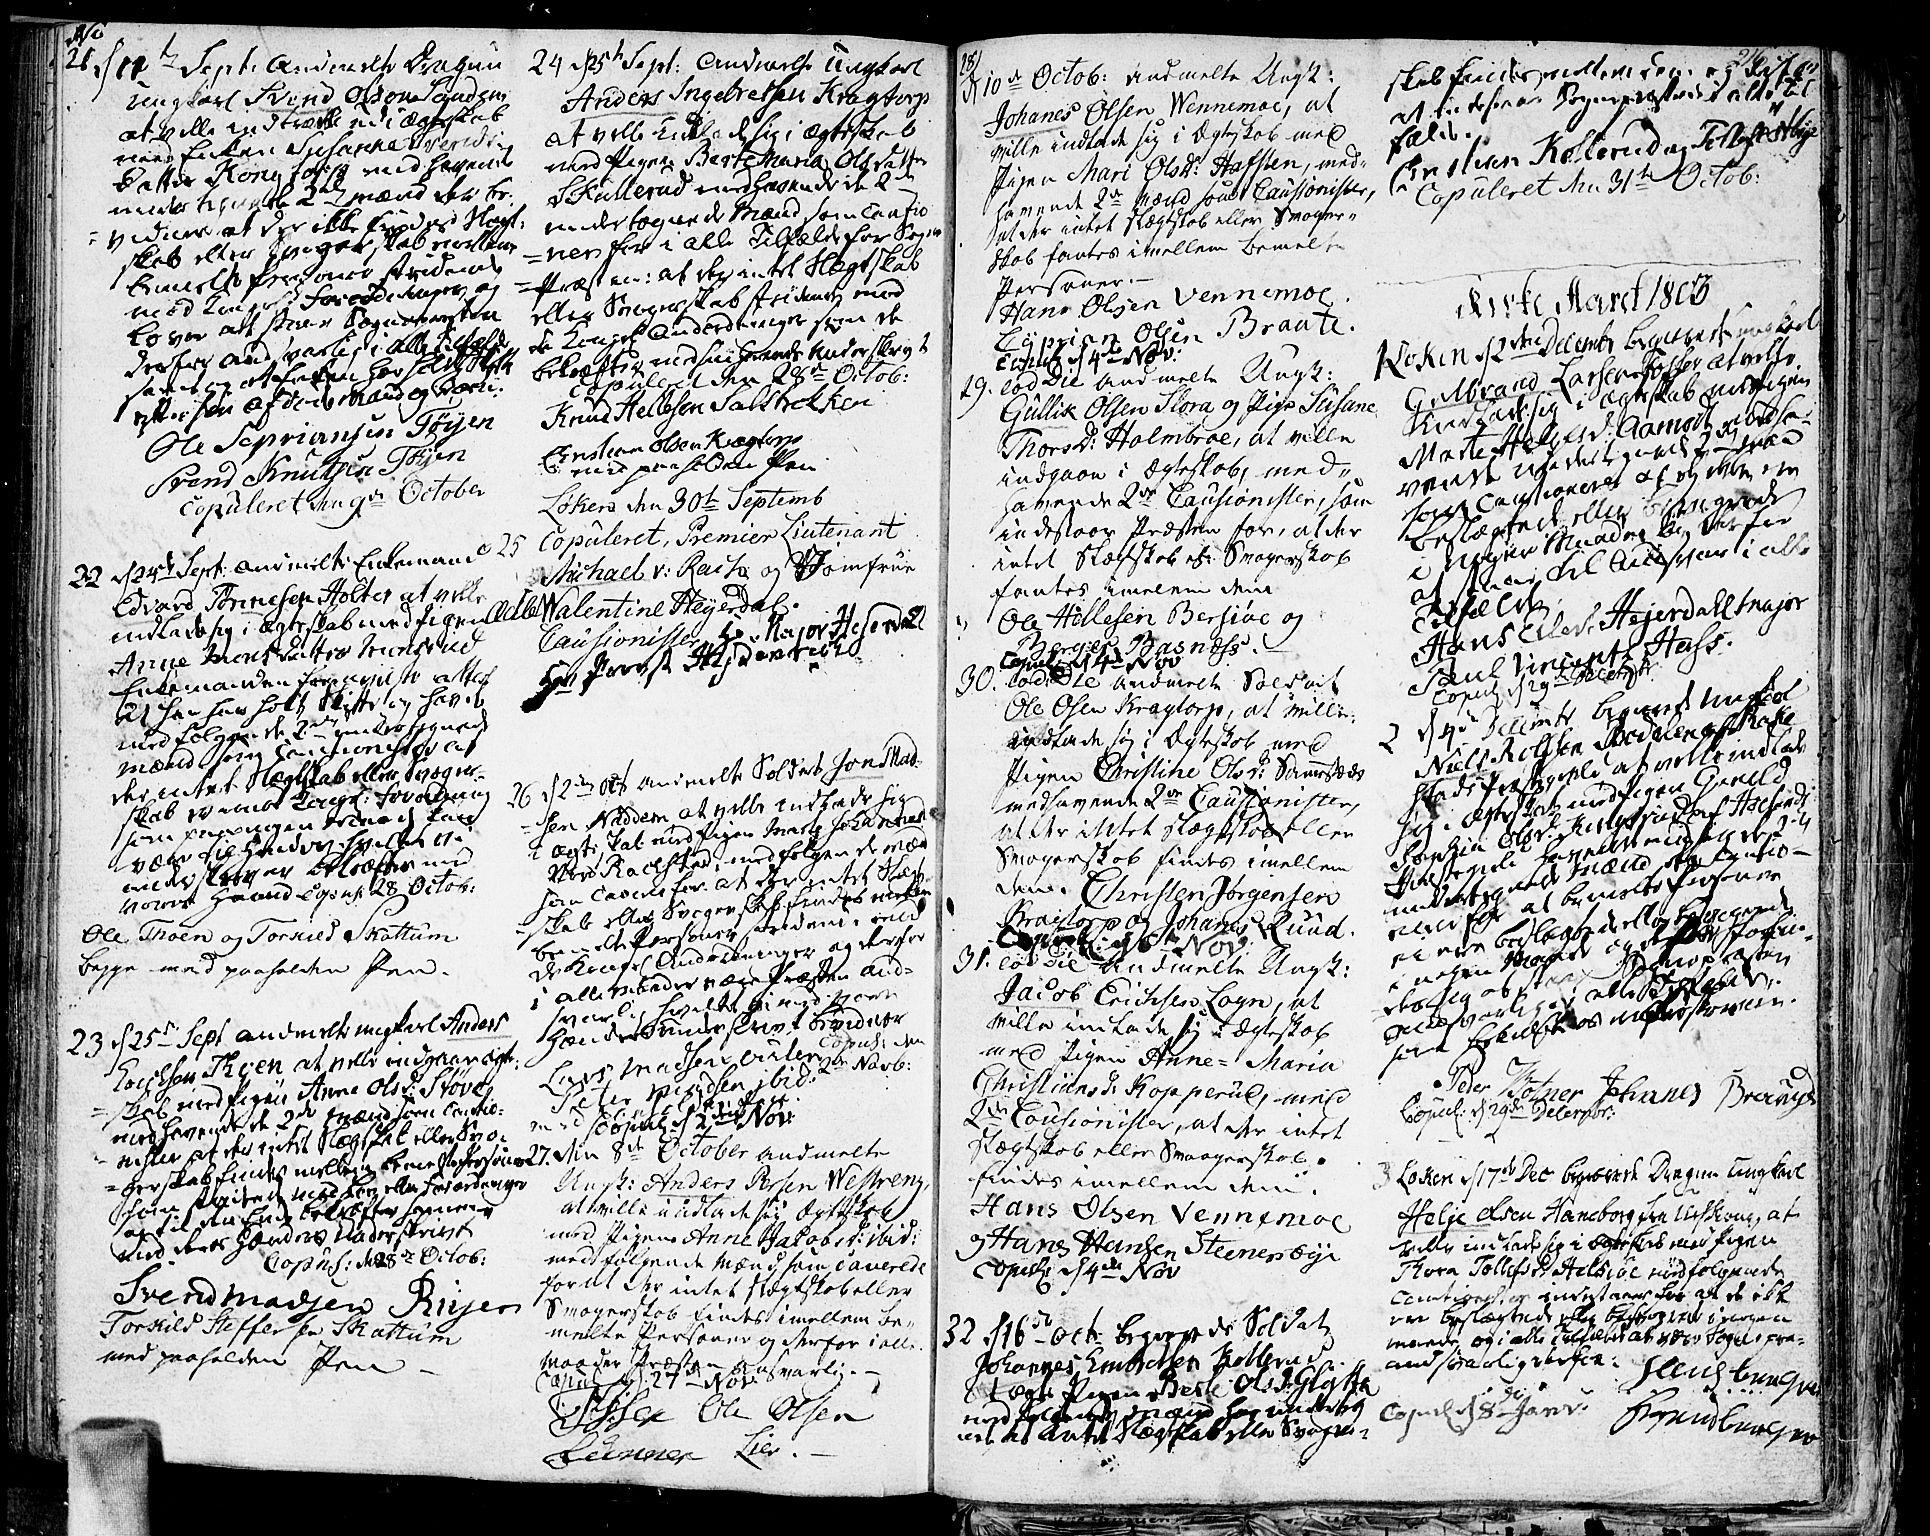 SAO, Høland prestekontor Kirkebøker, F/Fa/L0006: Ministerialbok nr. I 6, 1794-1814, s. 216